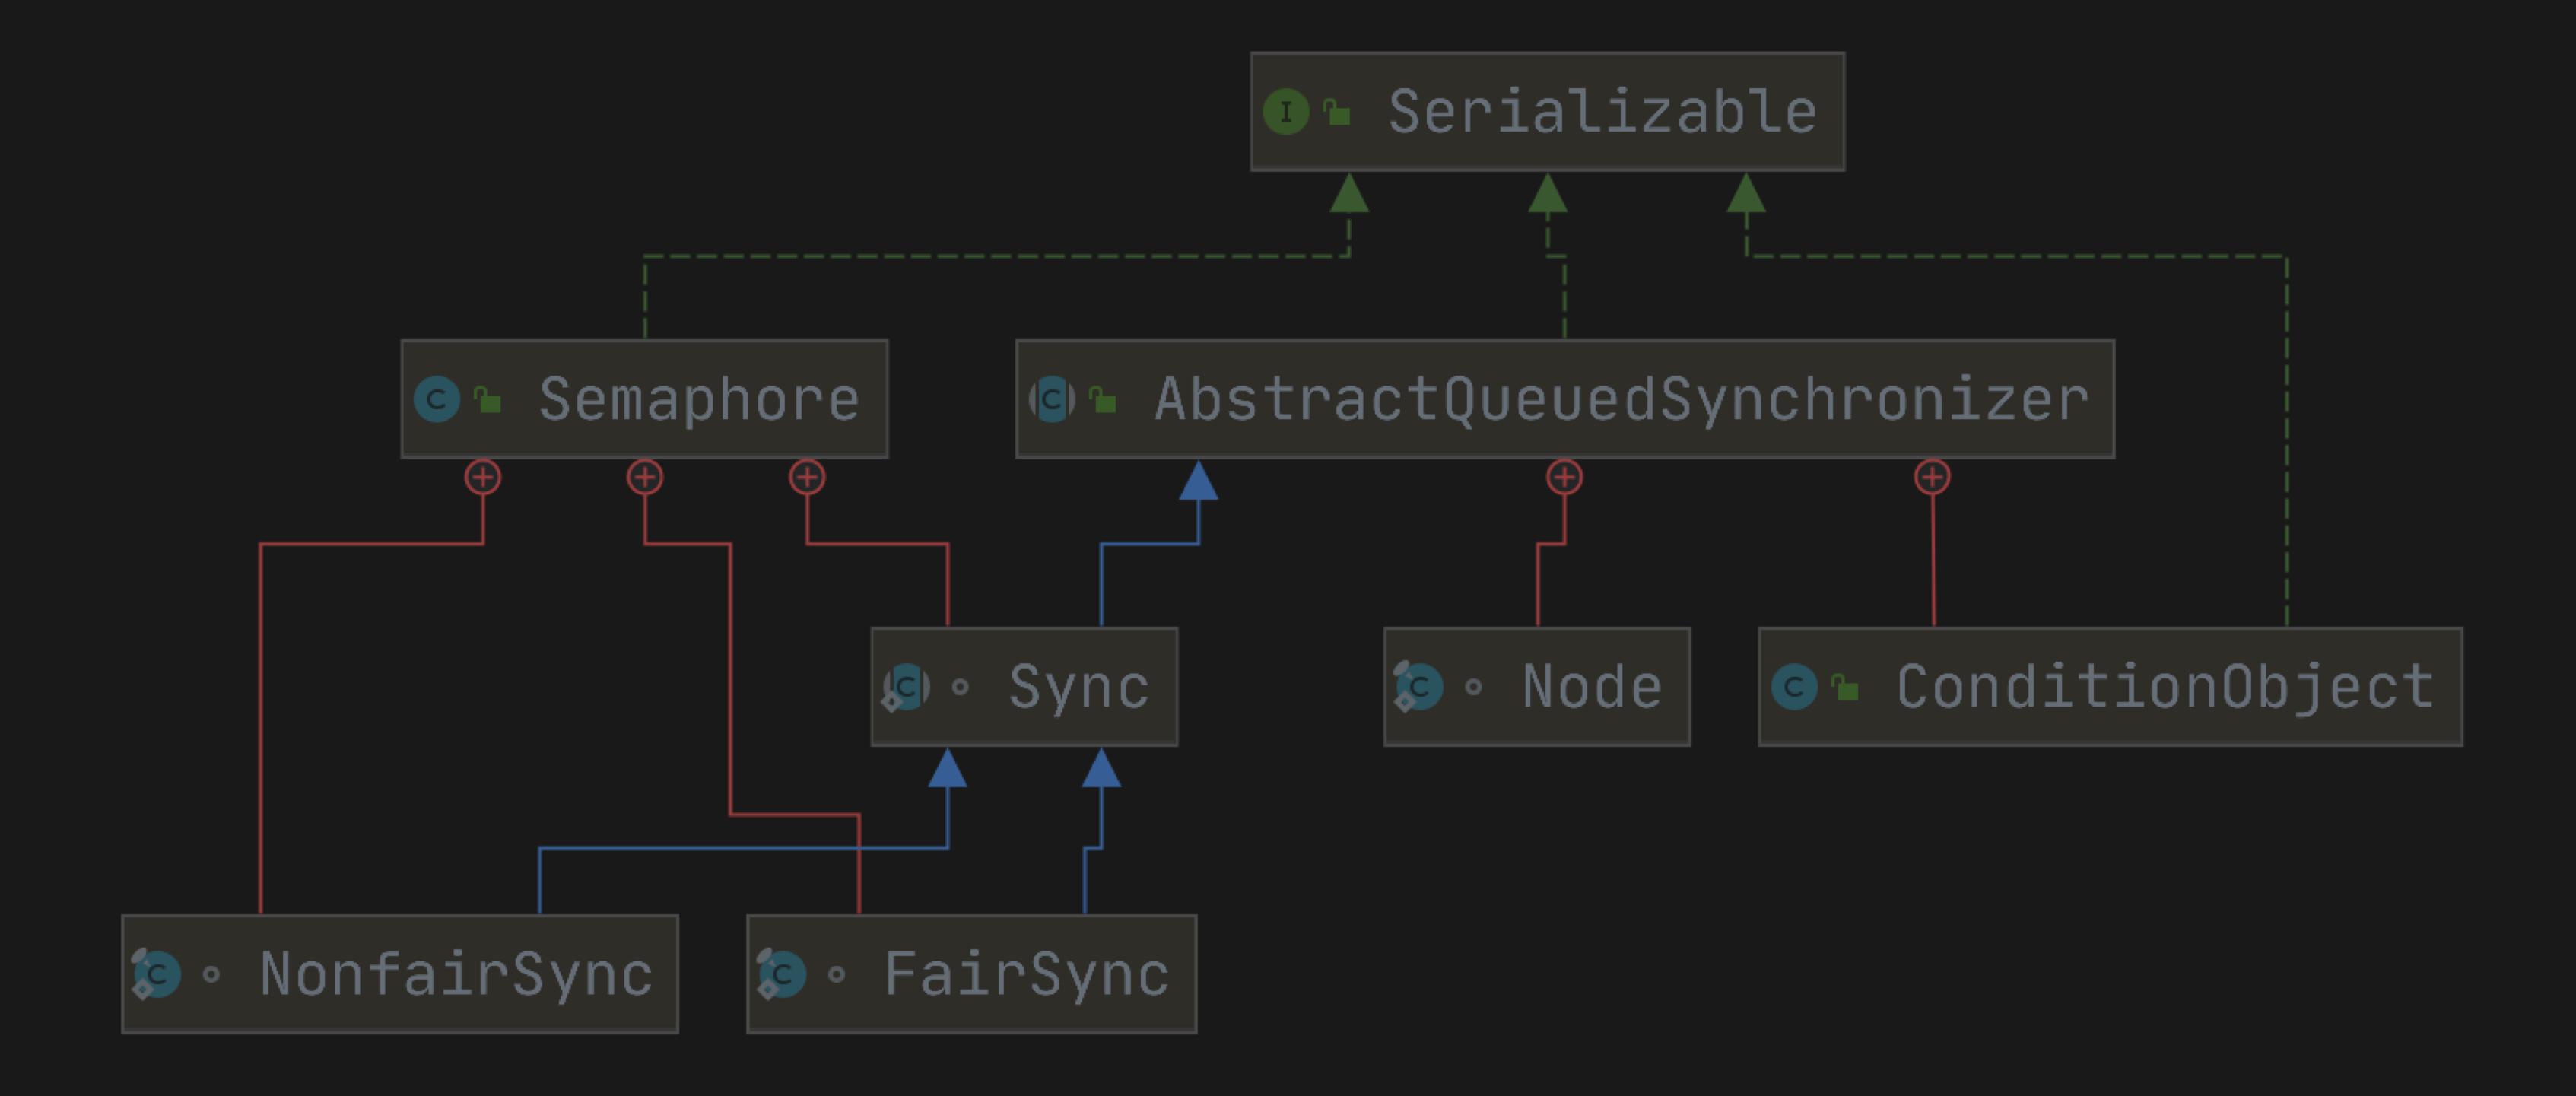 【JDK源码笔记】- 使用递增计数器的线程同步工具 —— 信号量,它的原理是什么样子的?